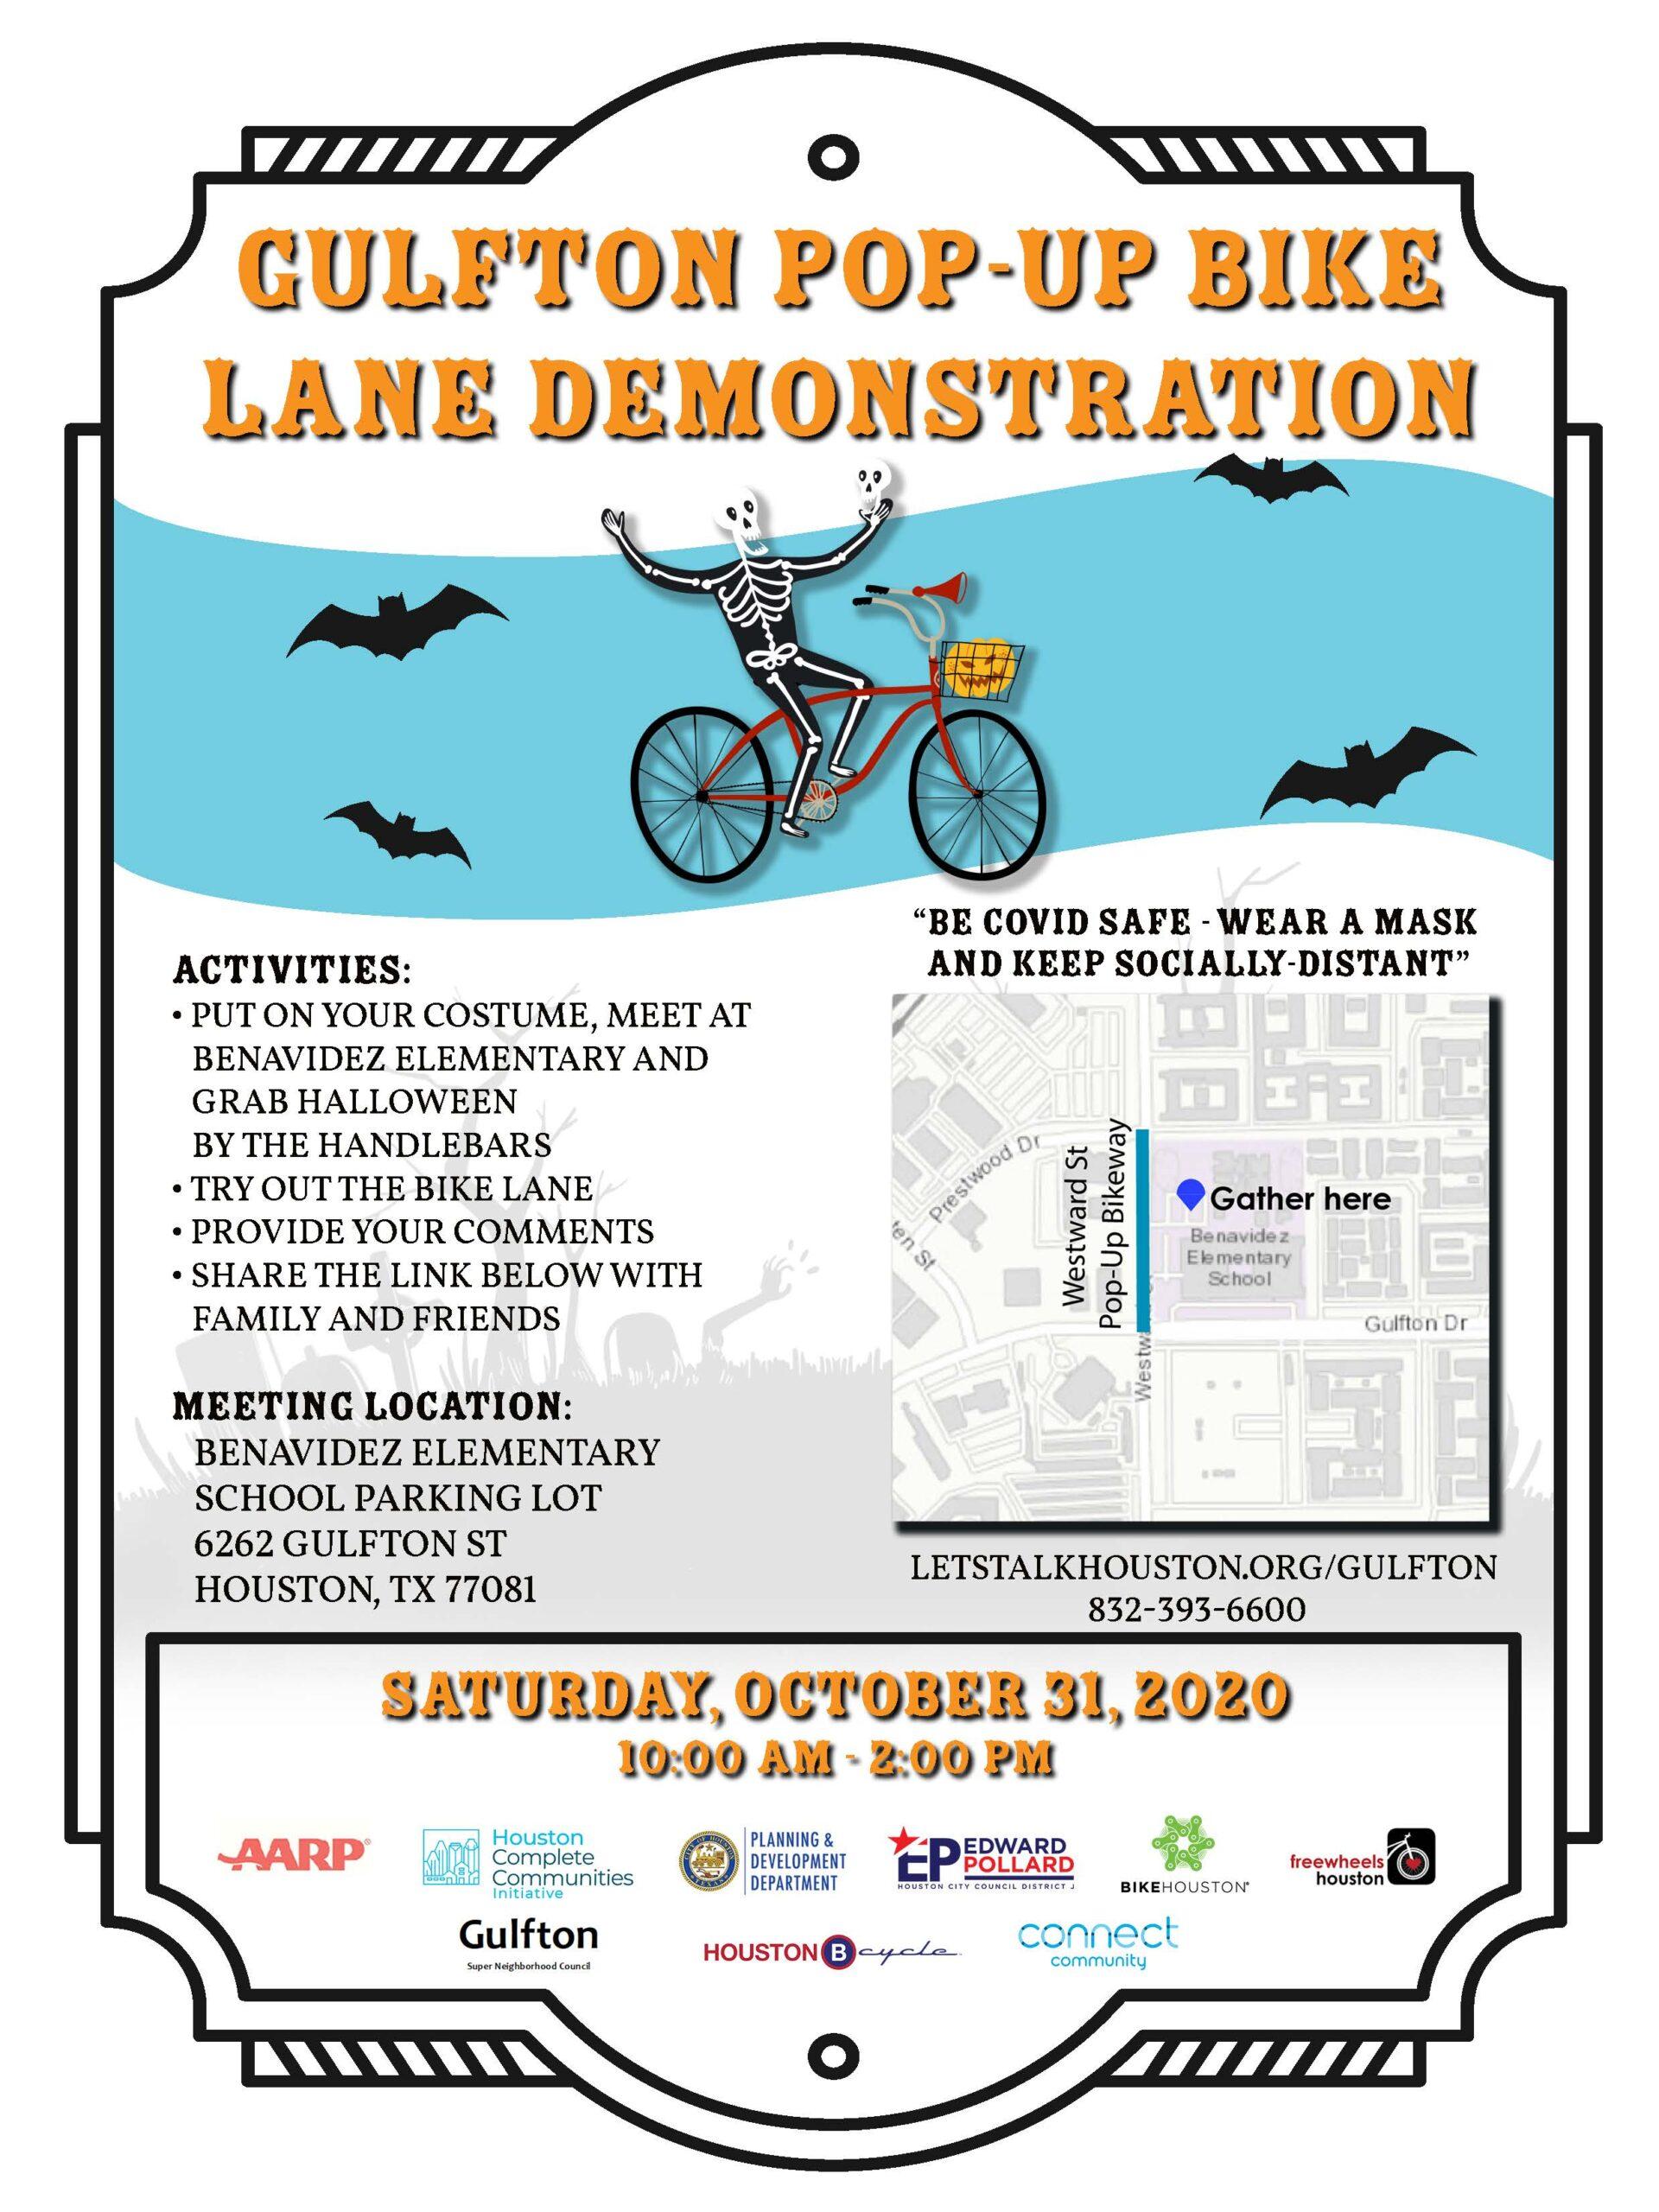 Gulfton Pop-up Bike Lane Demonstration